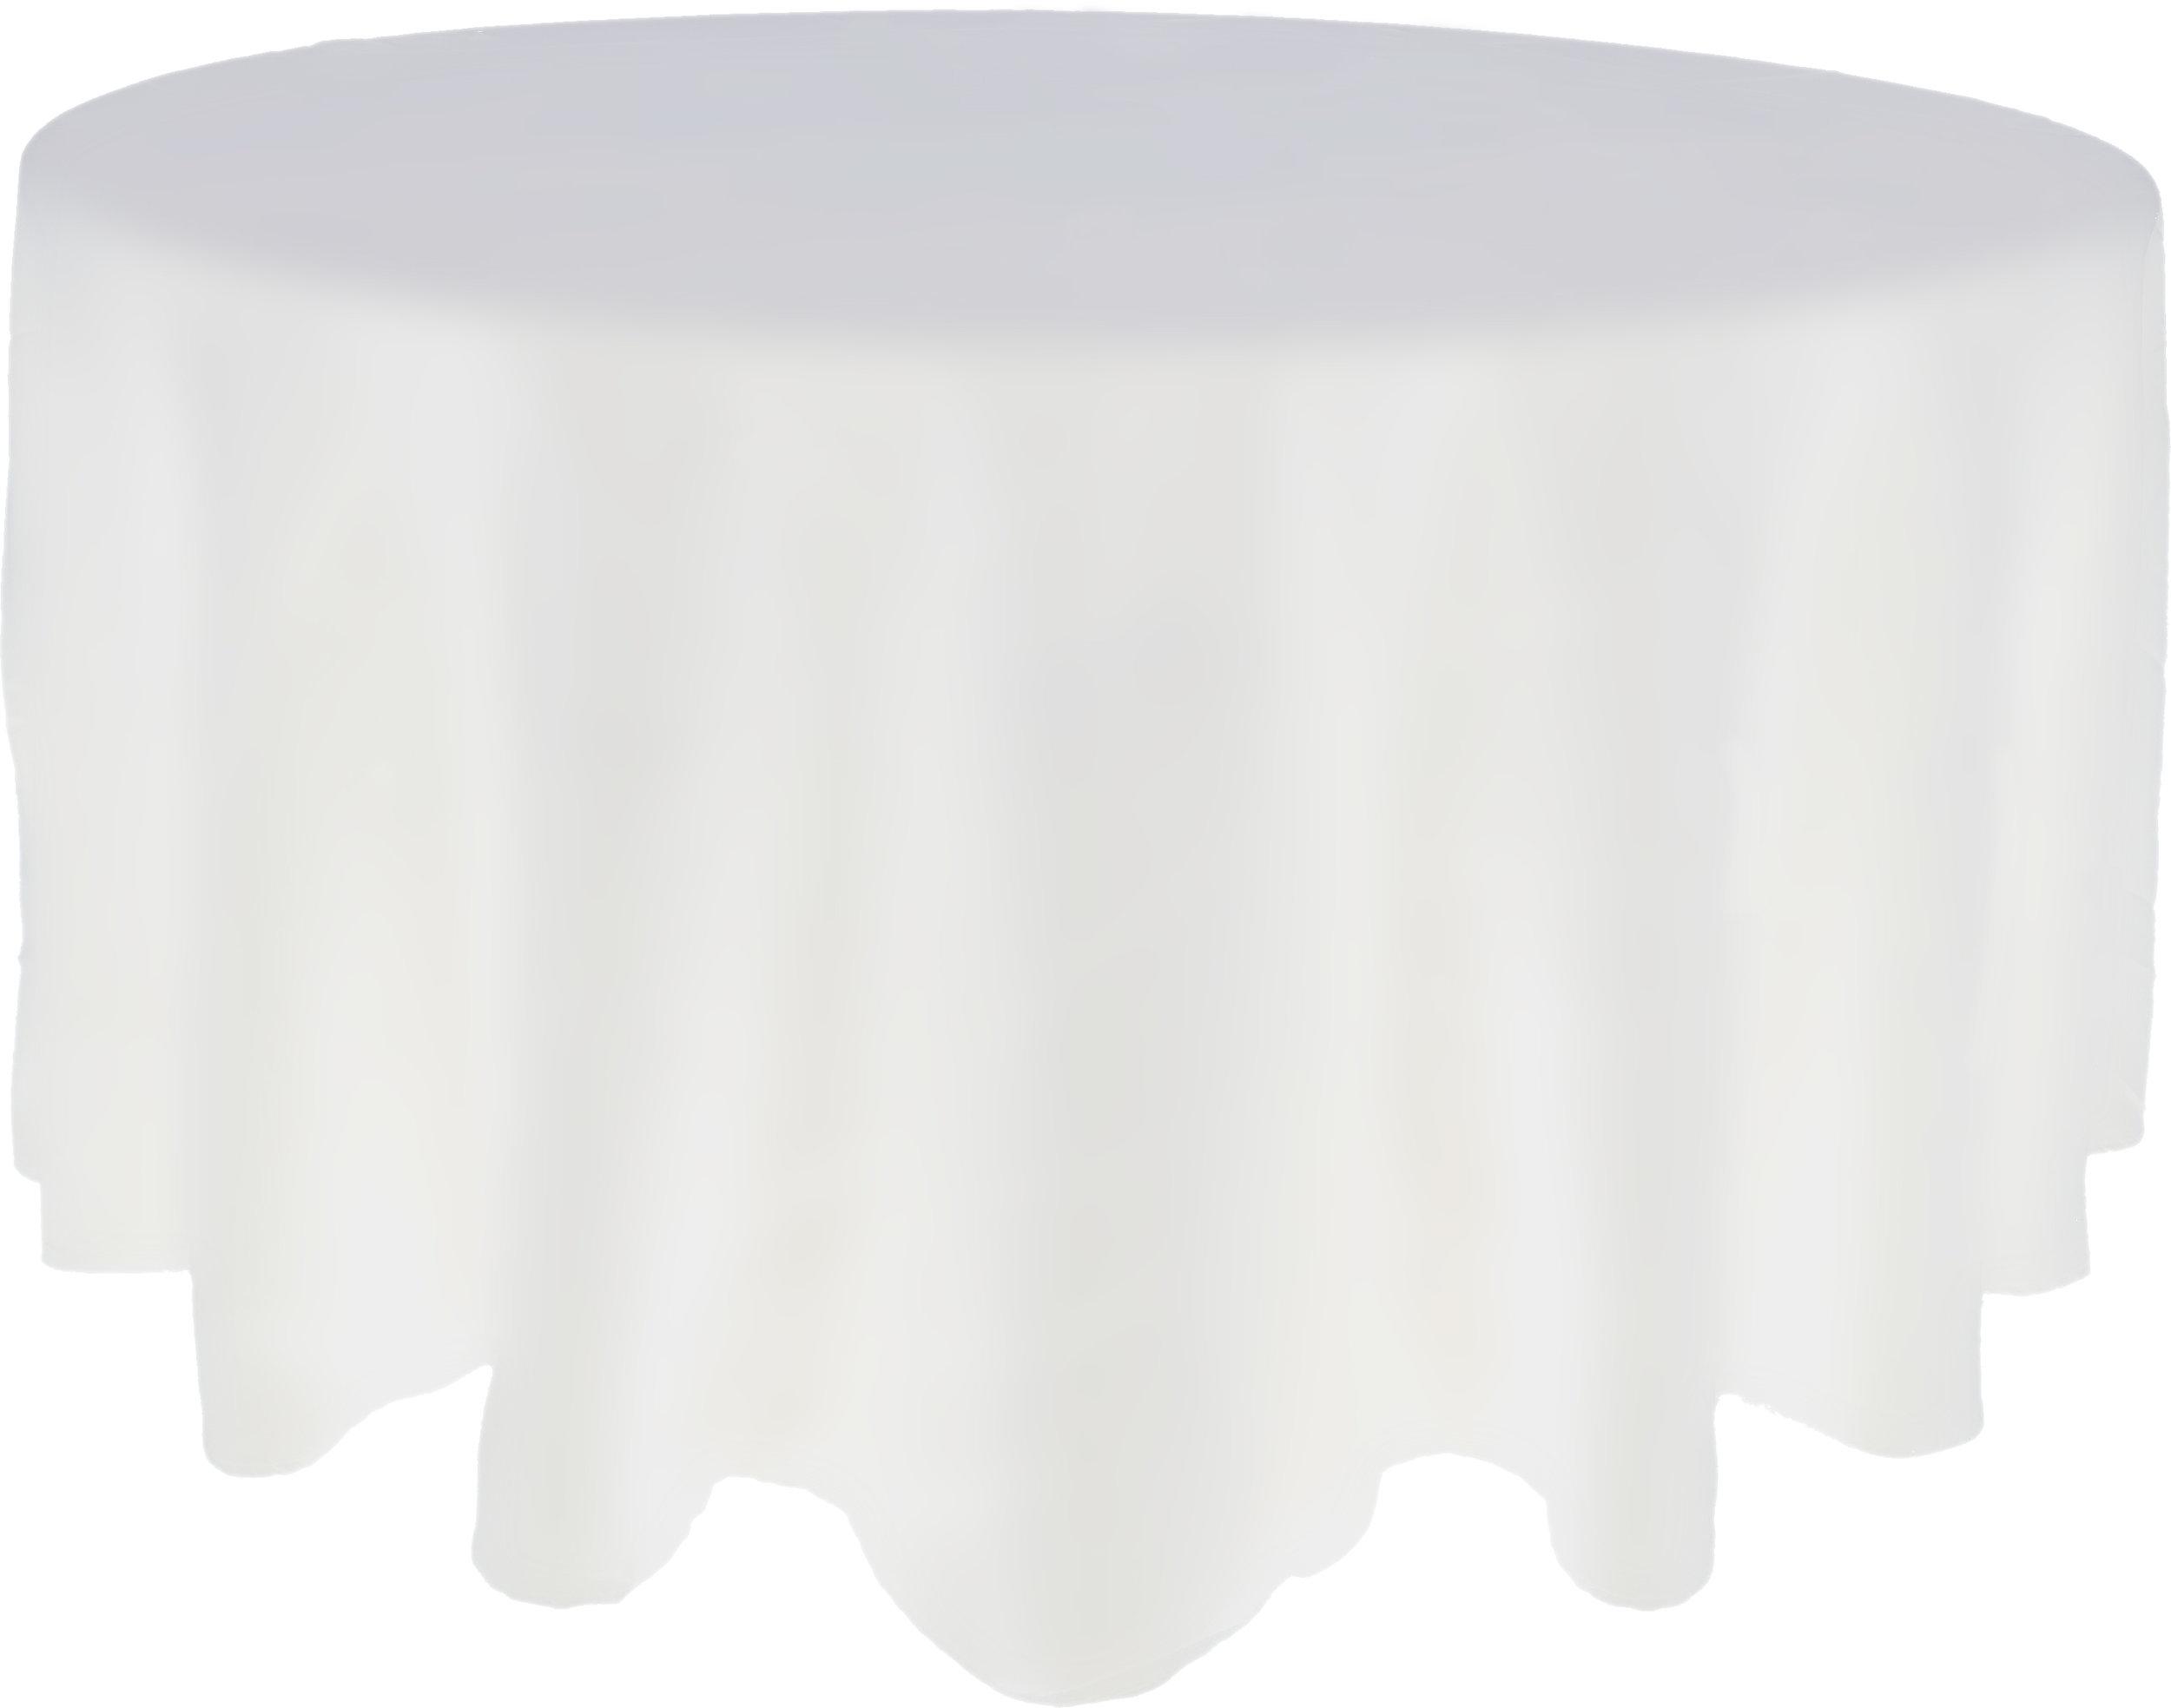 tableclothwhite.jpg